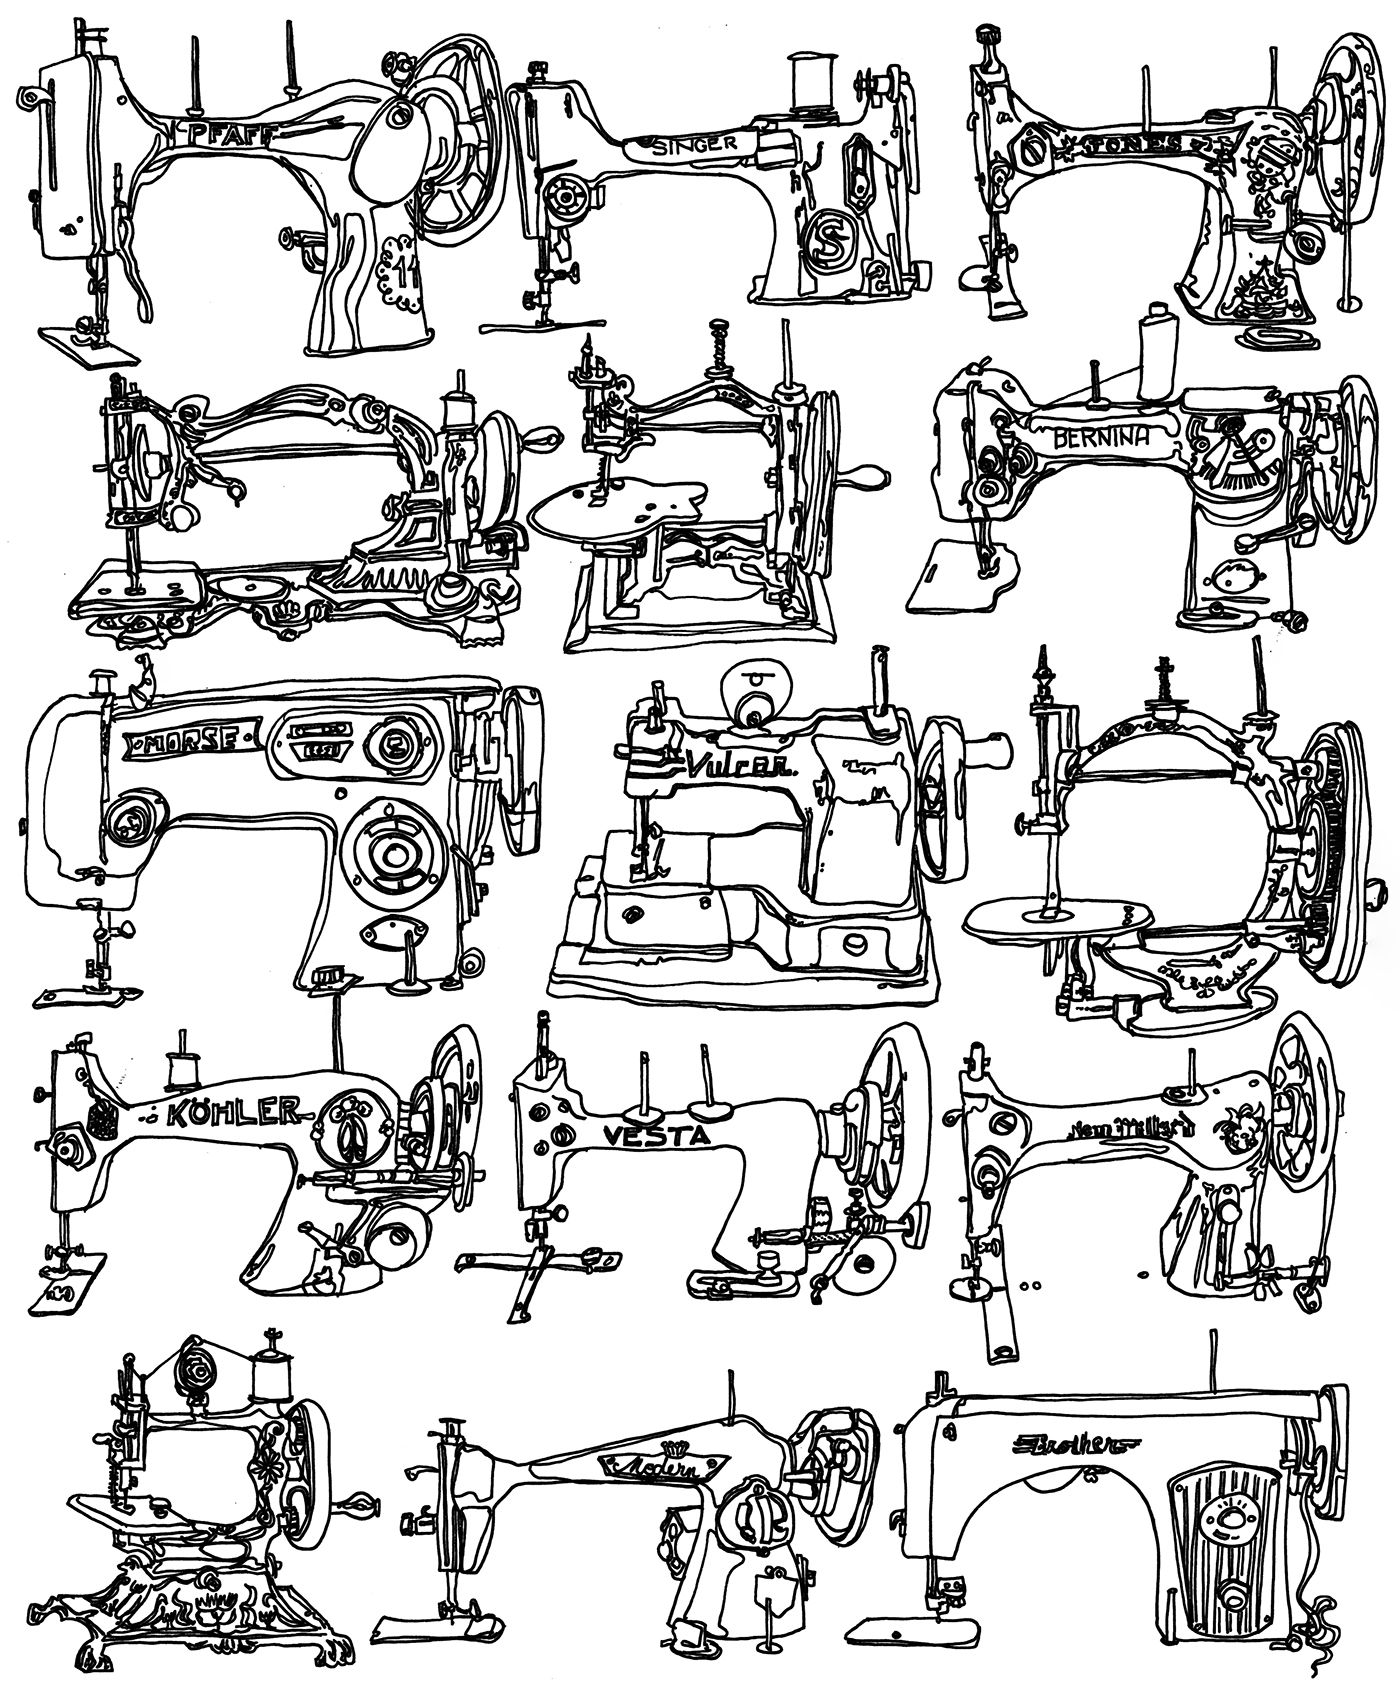 Vintage Sewing Machines On Behance